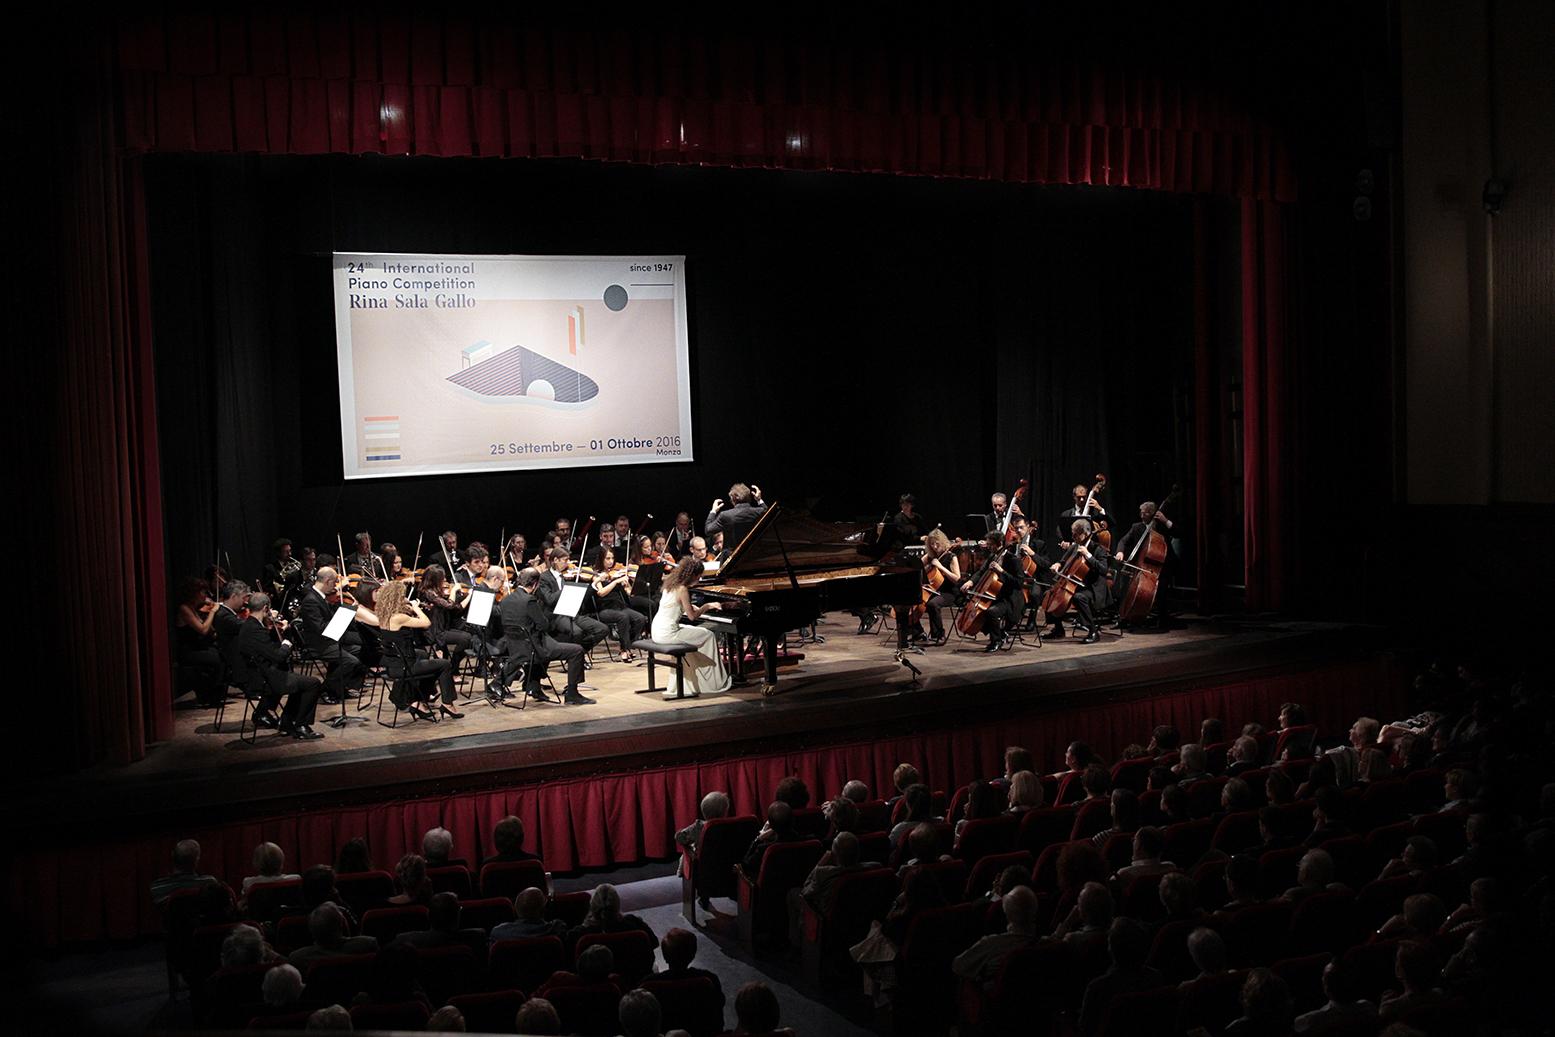 International Piano Competition Rina Sala Gallo 2016 24th edition. Monza, Italy. Maddalena Giacopuzzi.